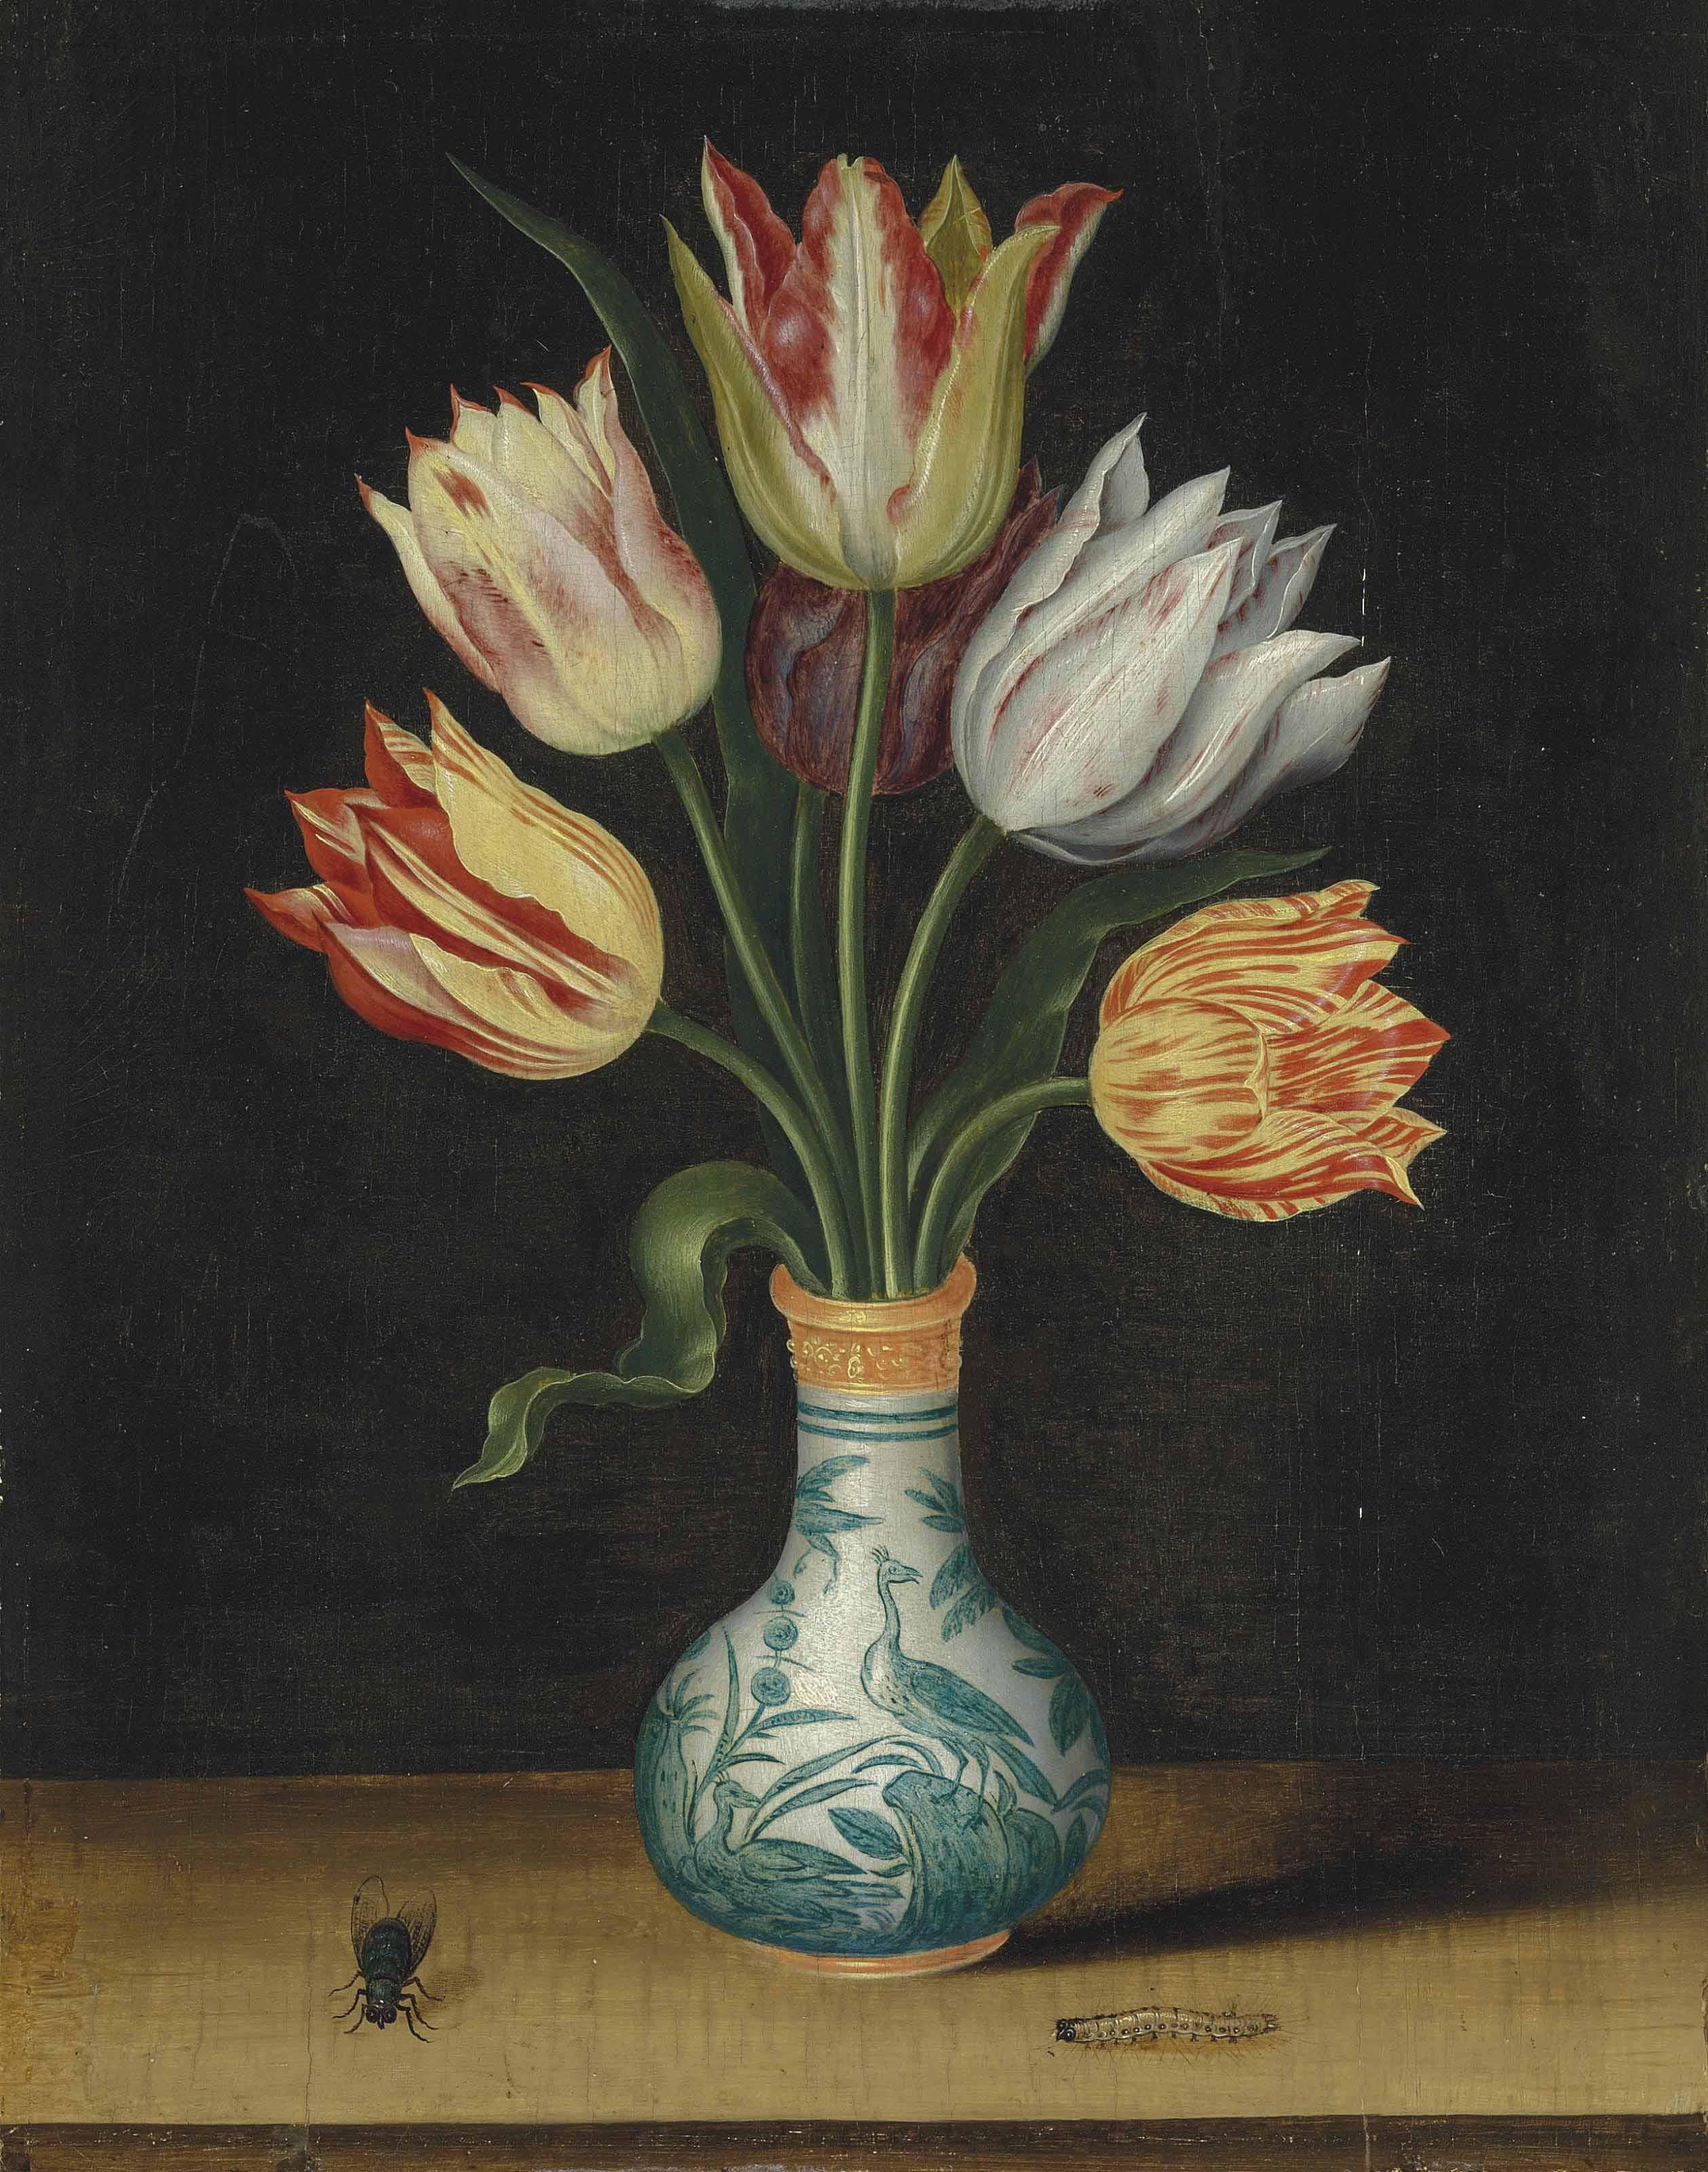 Circle of Ambrosius Bosschaert I (Antwerp 1573-1621 The Hague)